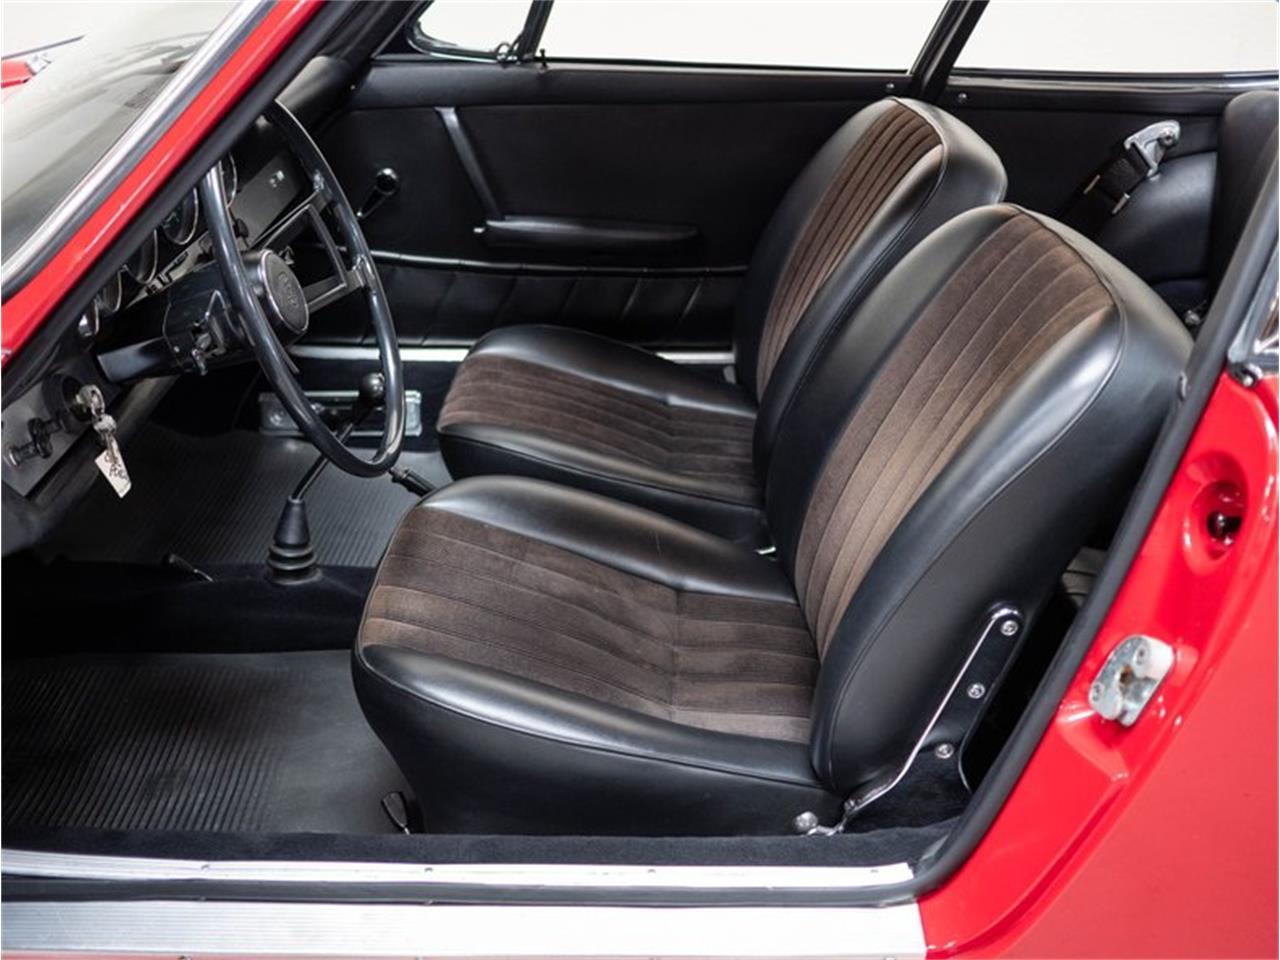 1967 Porsche 911 (CC-1310273) for sale in Fallbrook, California